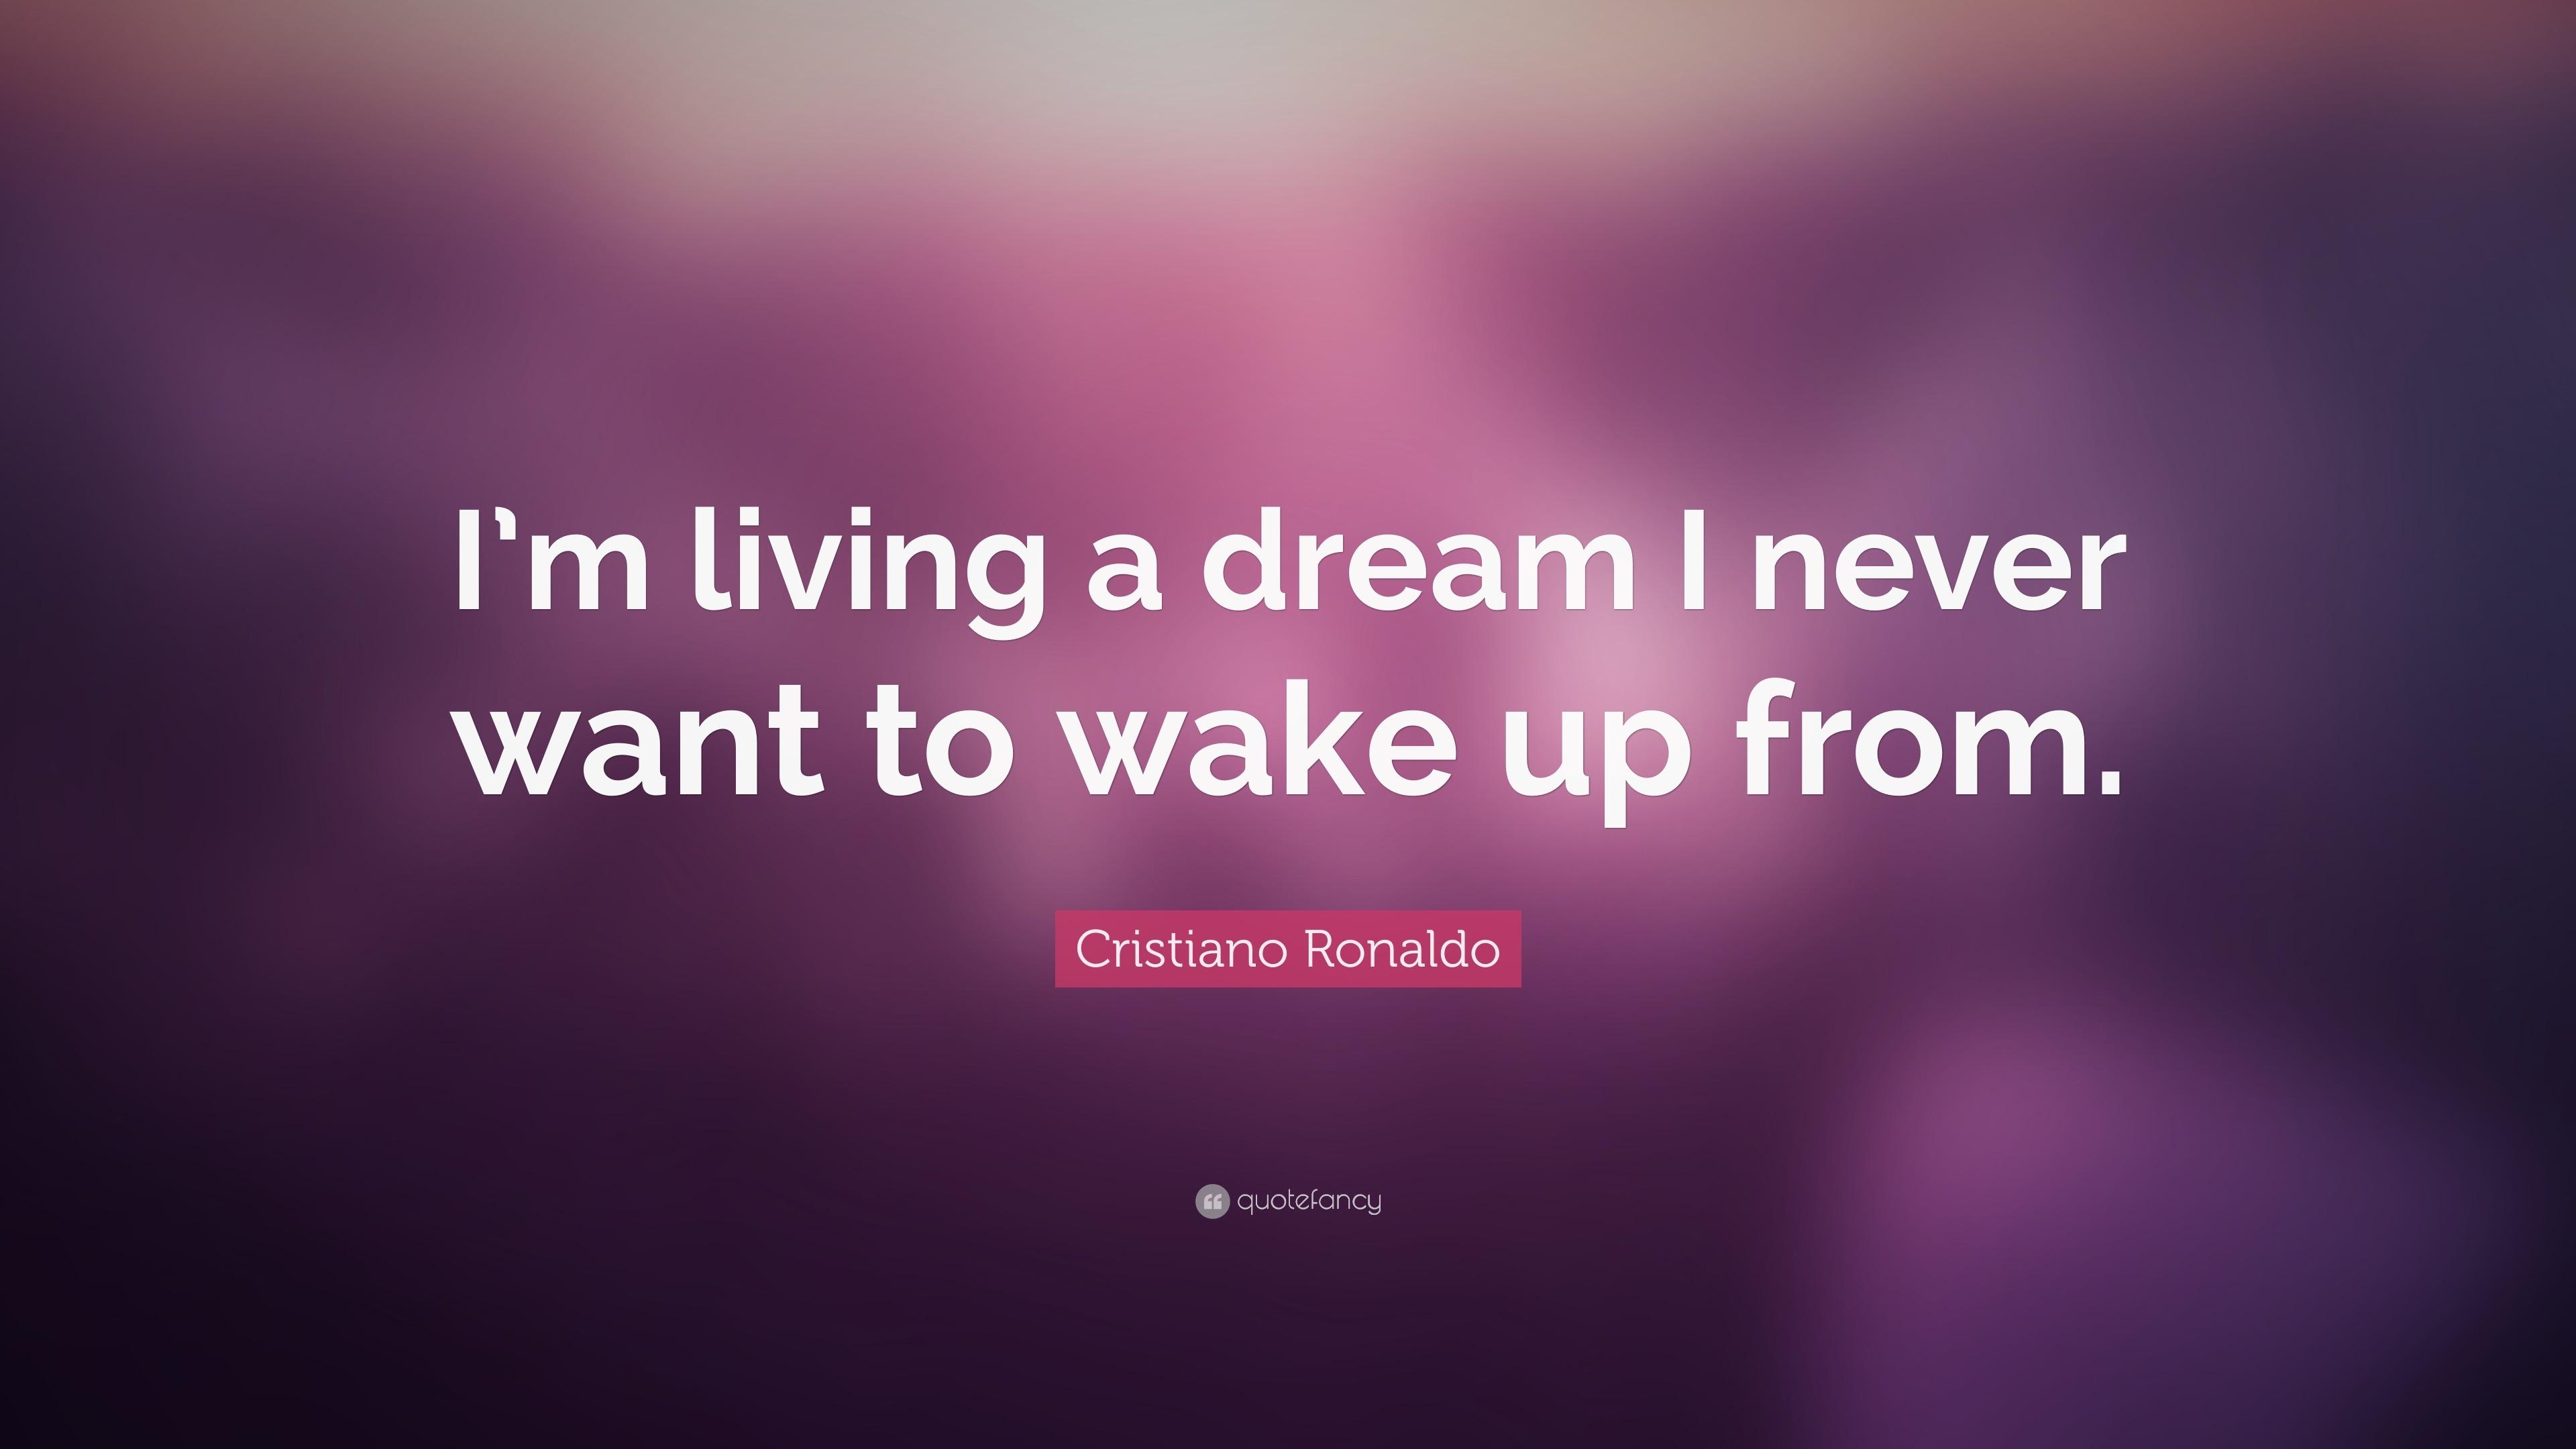 Cristiano Ronaldo Quotes (100 Wallpapers)